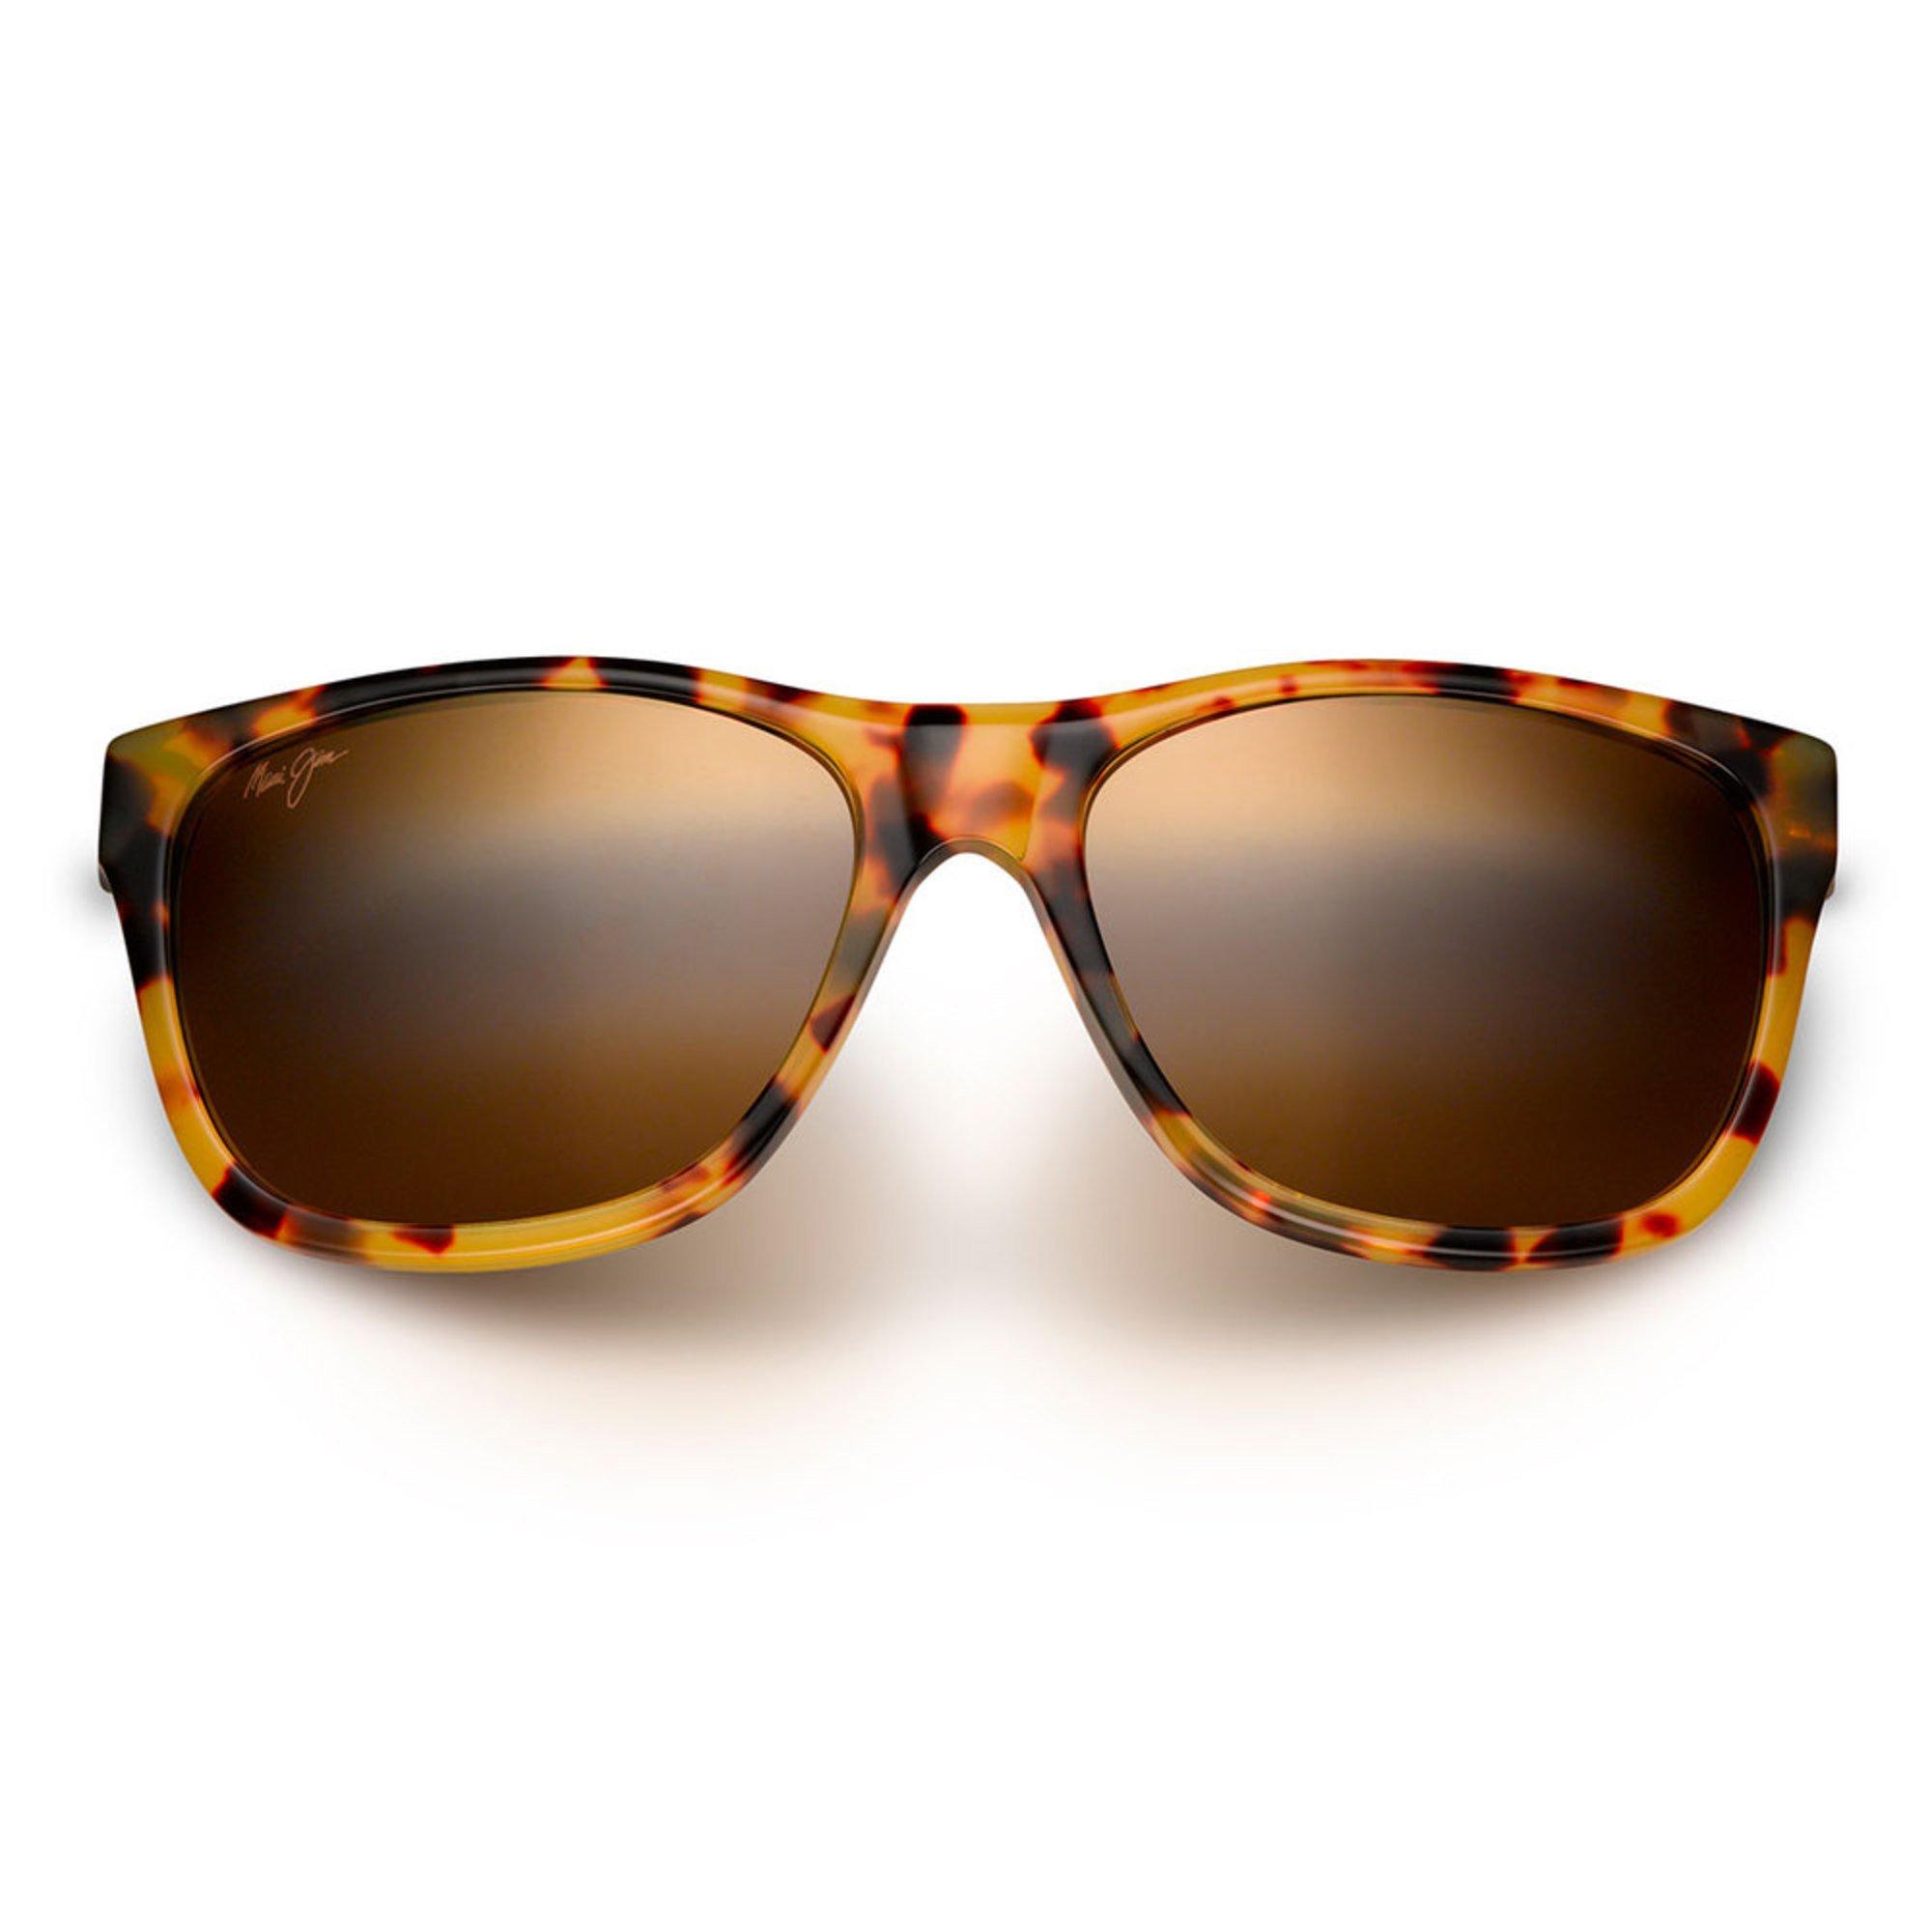 449399f6b389 Maui Jim. Maui Jim Unisex Howzit Tokyo Tortoise Rectangular Sunglasses